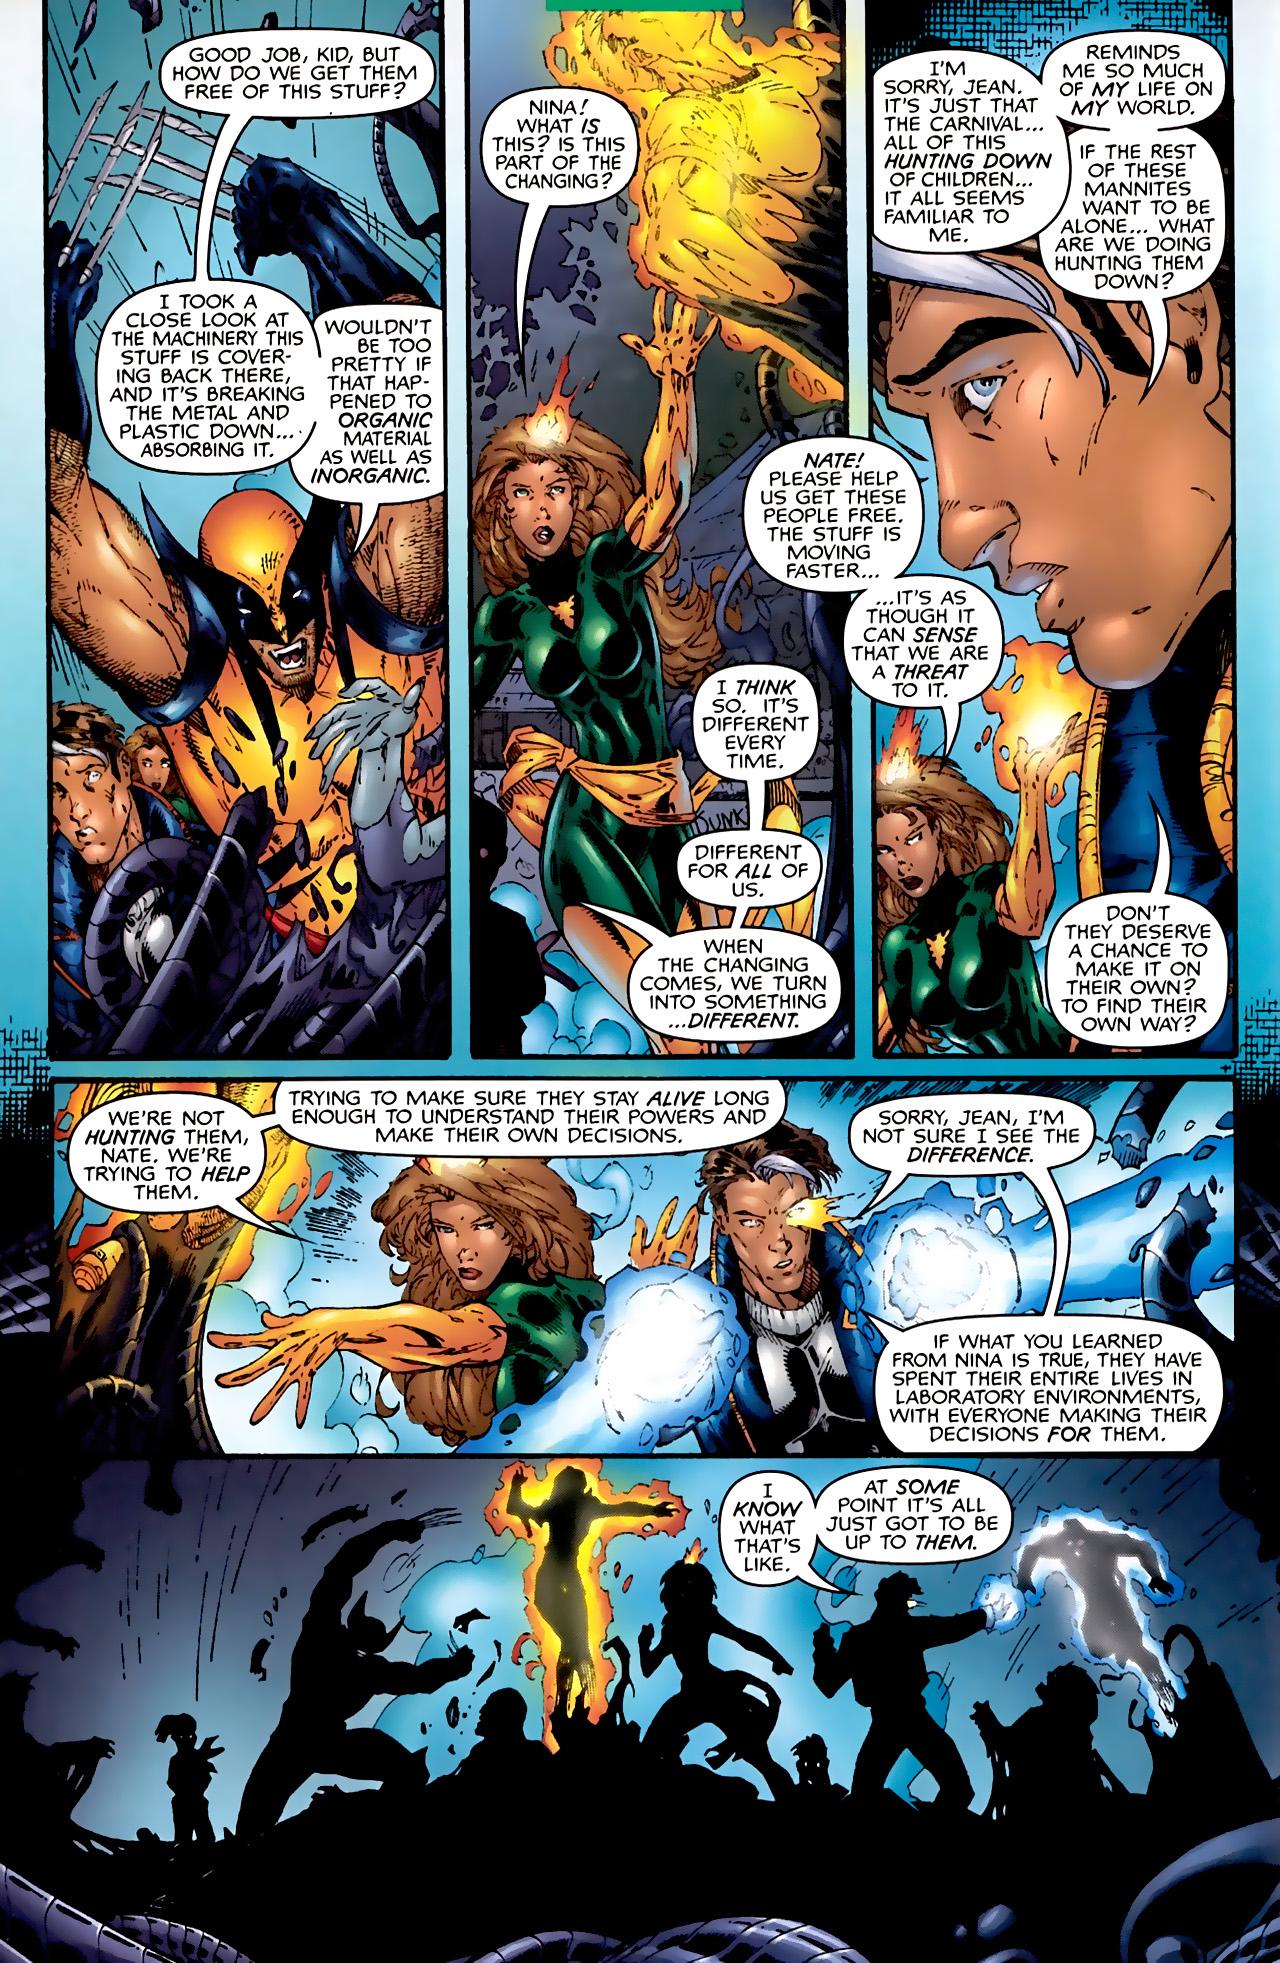 Read online Astonishing X-Men (1999) comic -  Issue #2 - 9